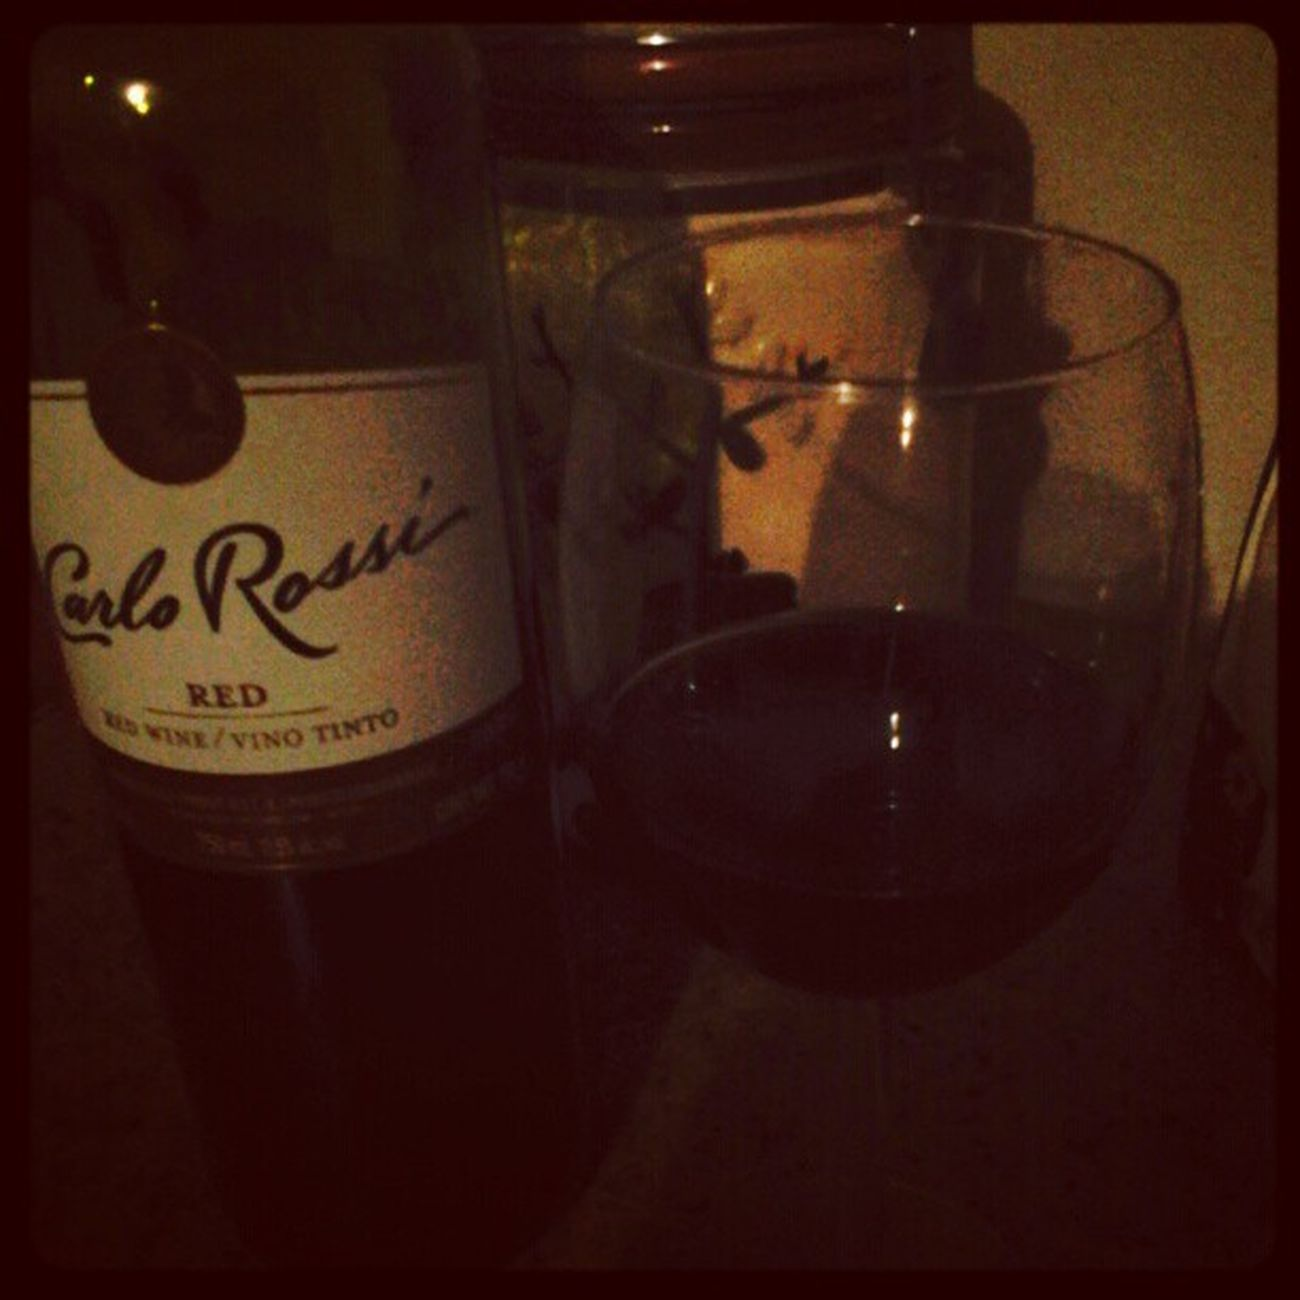 Wine night With my buddy :') @maxieluc Instaphoto Instapic Instanight Randomnight night live